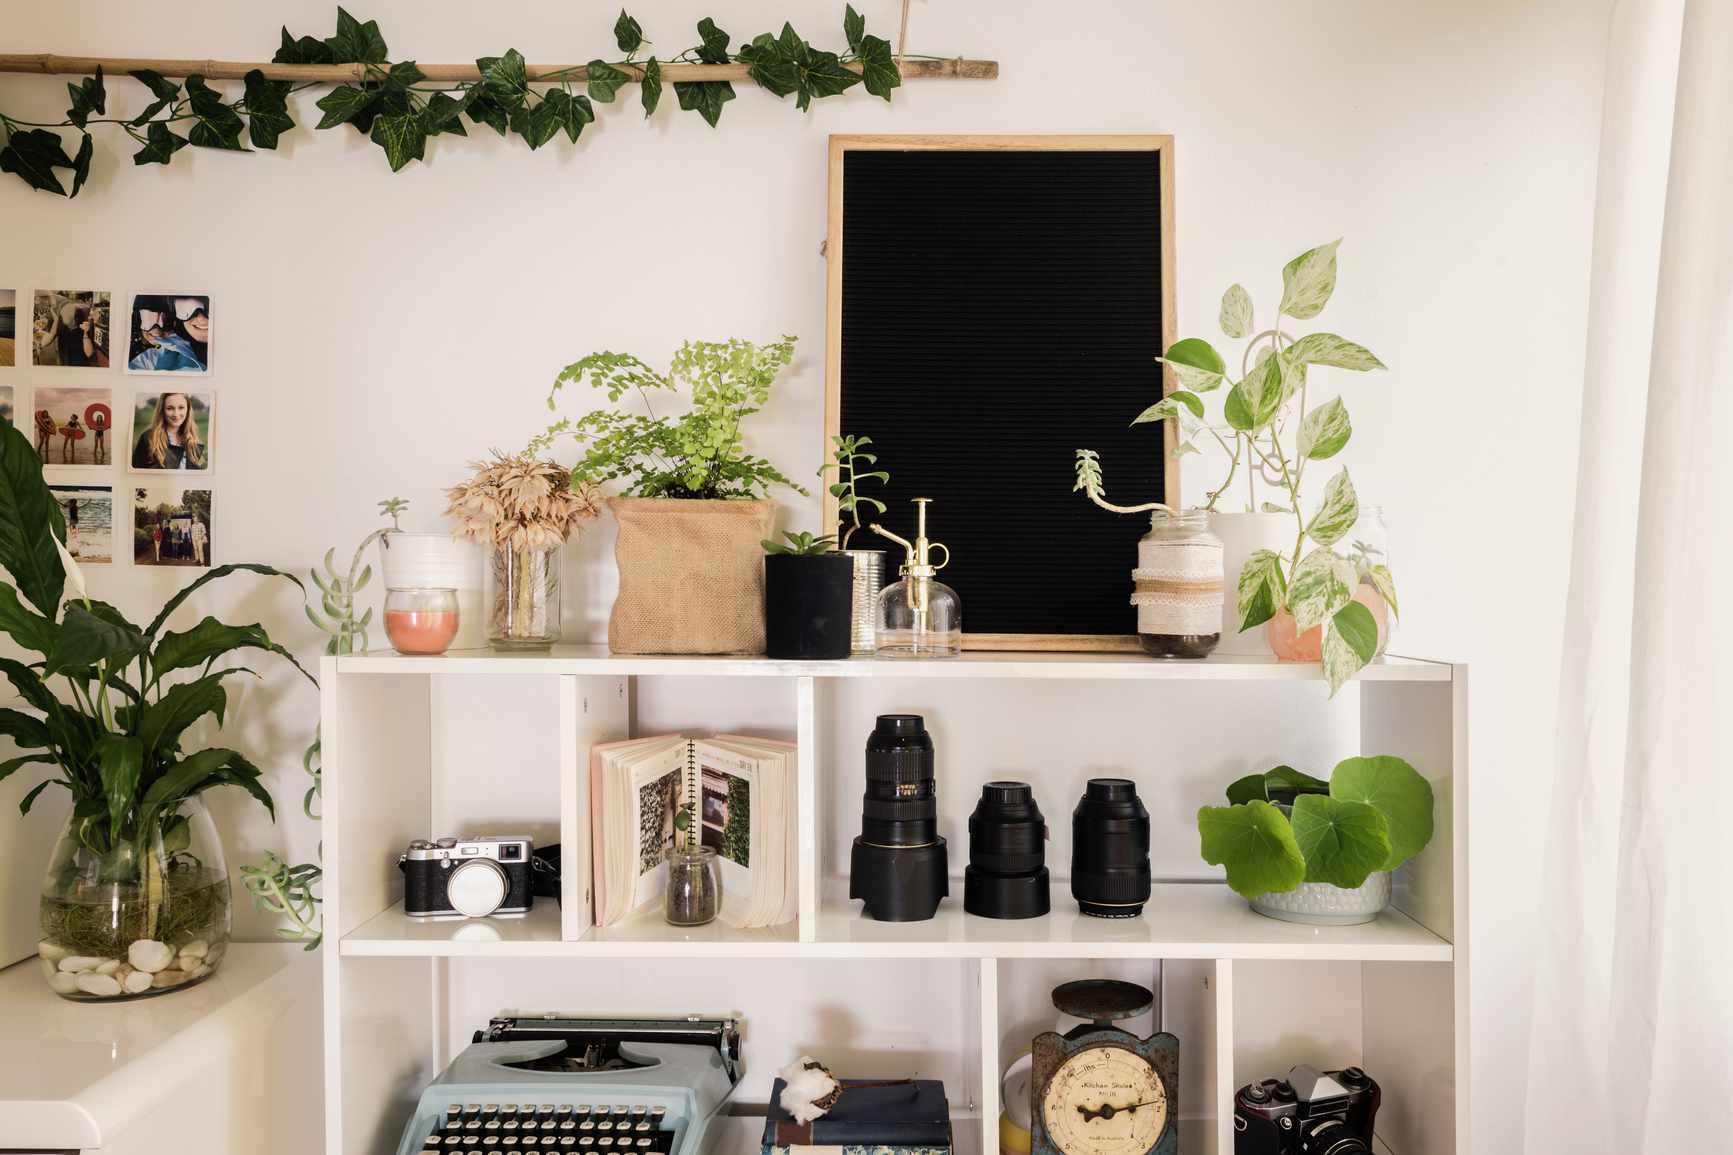 thrifted home decor items on shelf